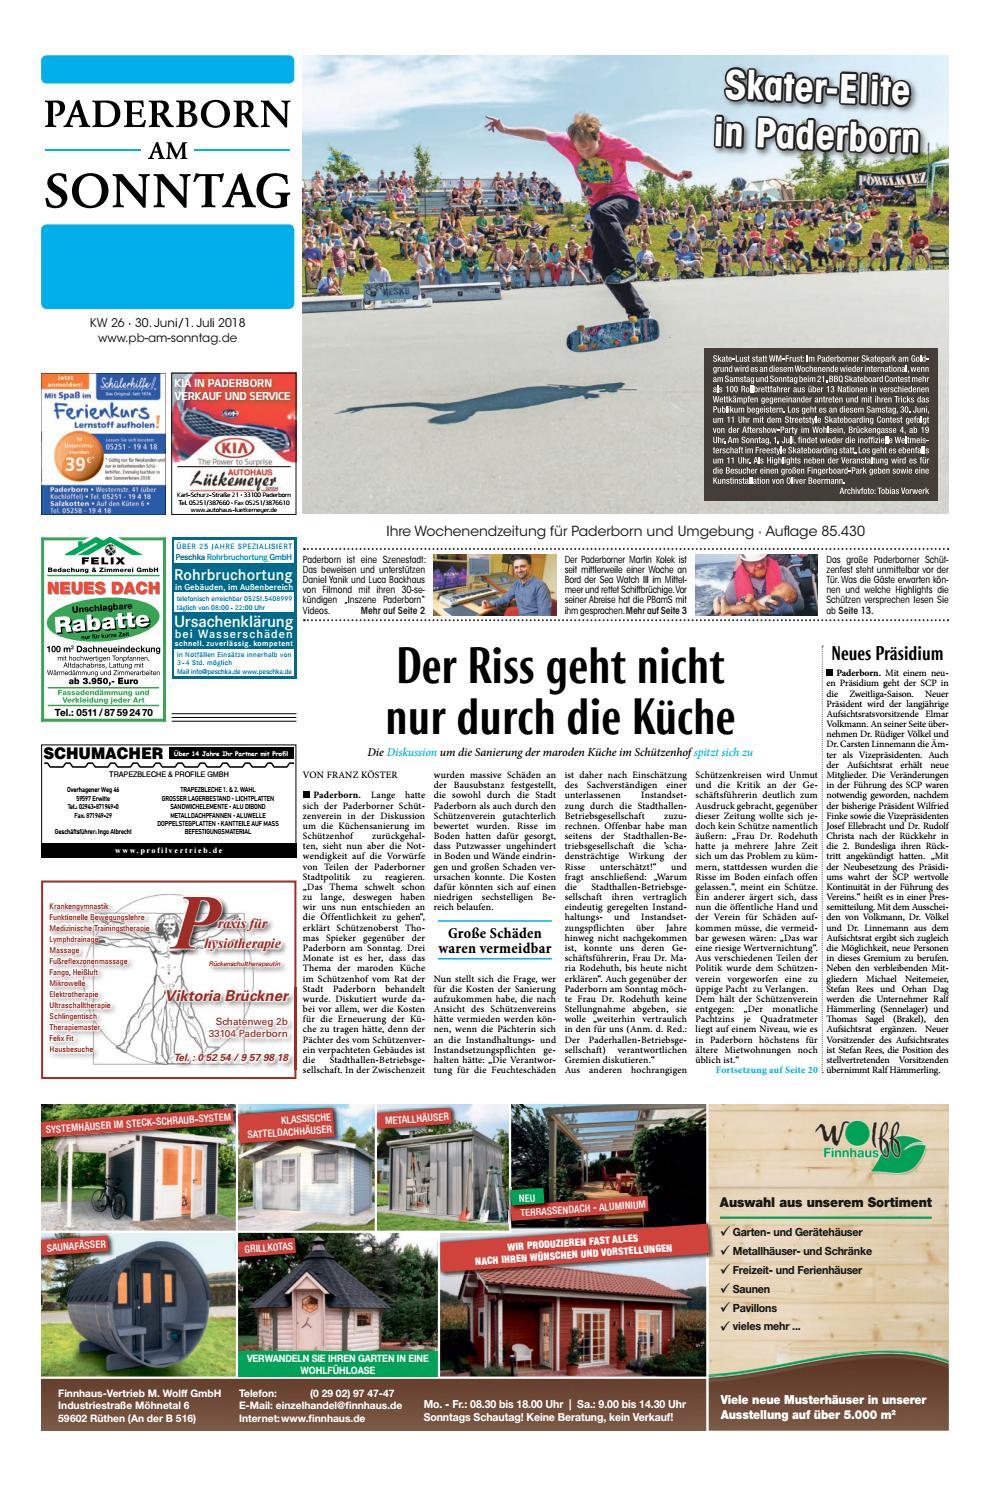 pbams-2018-26-06-30 by Pader-Verlag GmbH - issuu